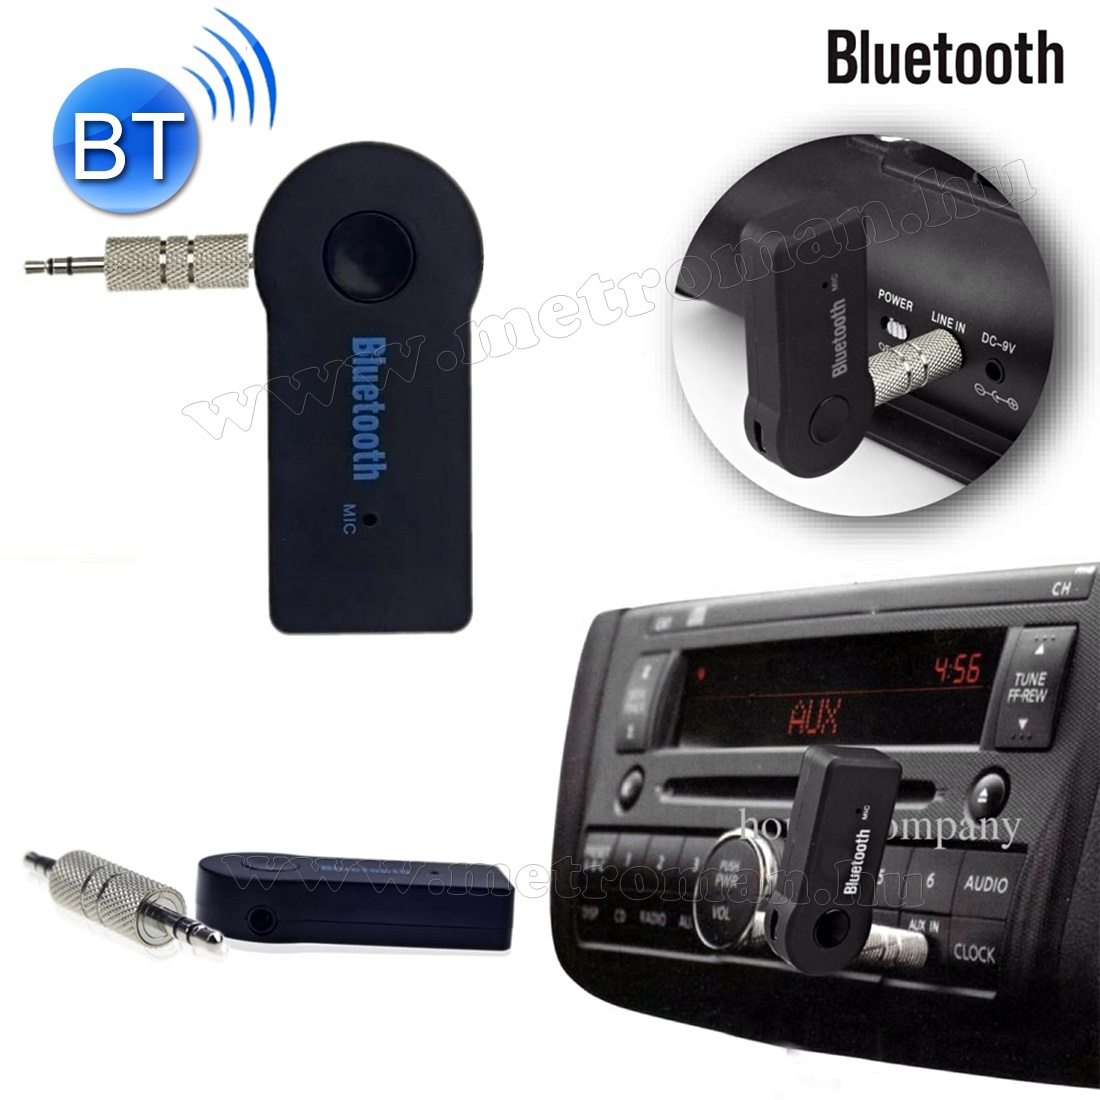 Jack autórádió Bluetooth adapter Mlogic BT310